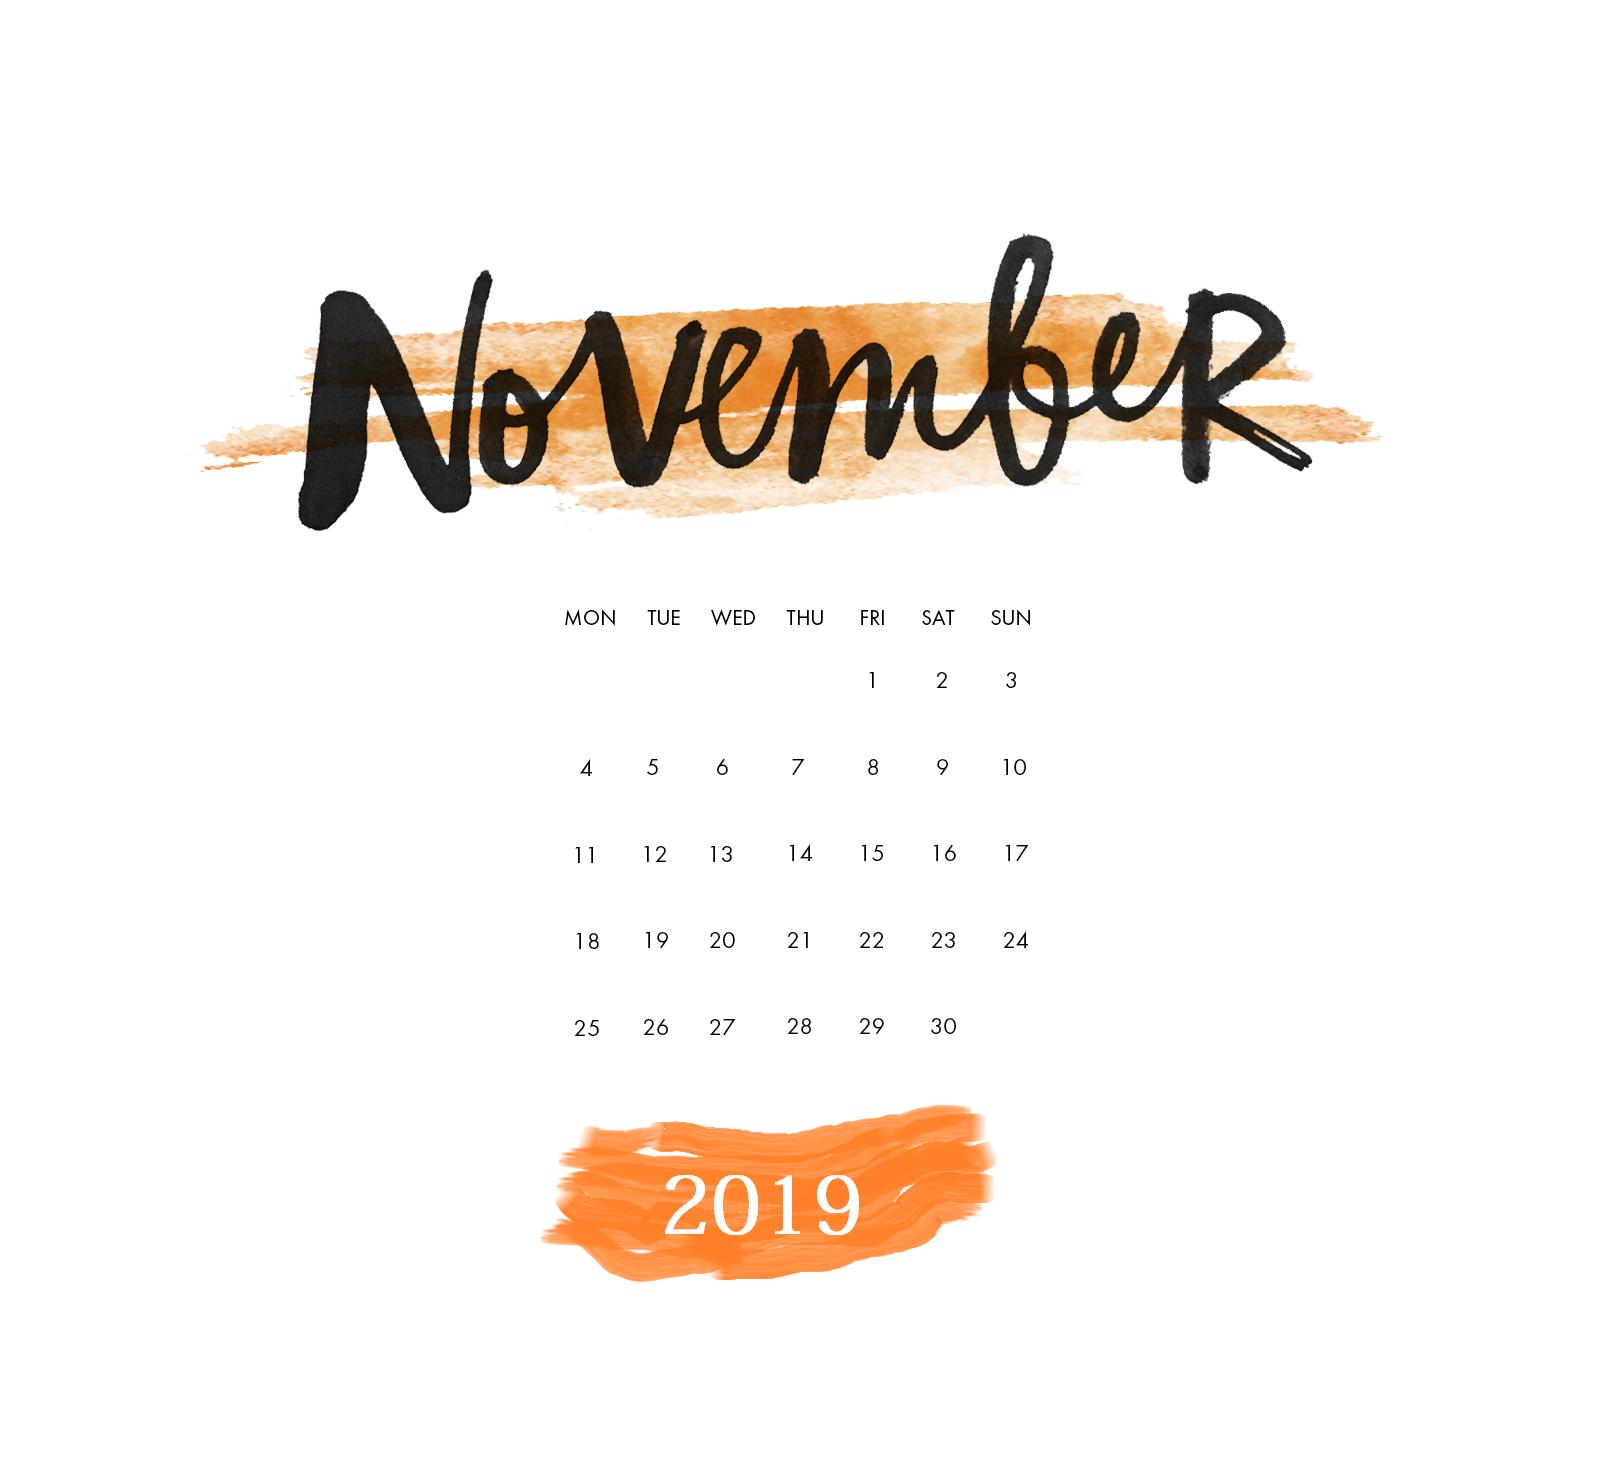 November 2019 Calendar Calendar 2019 Calendar Wallpaper Calendar Printables Iphone Wallpaper November